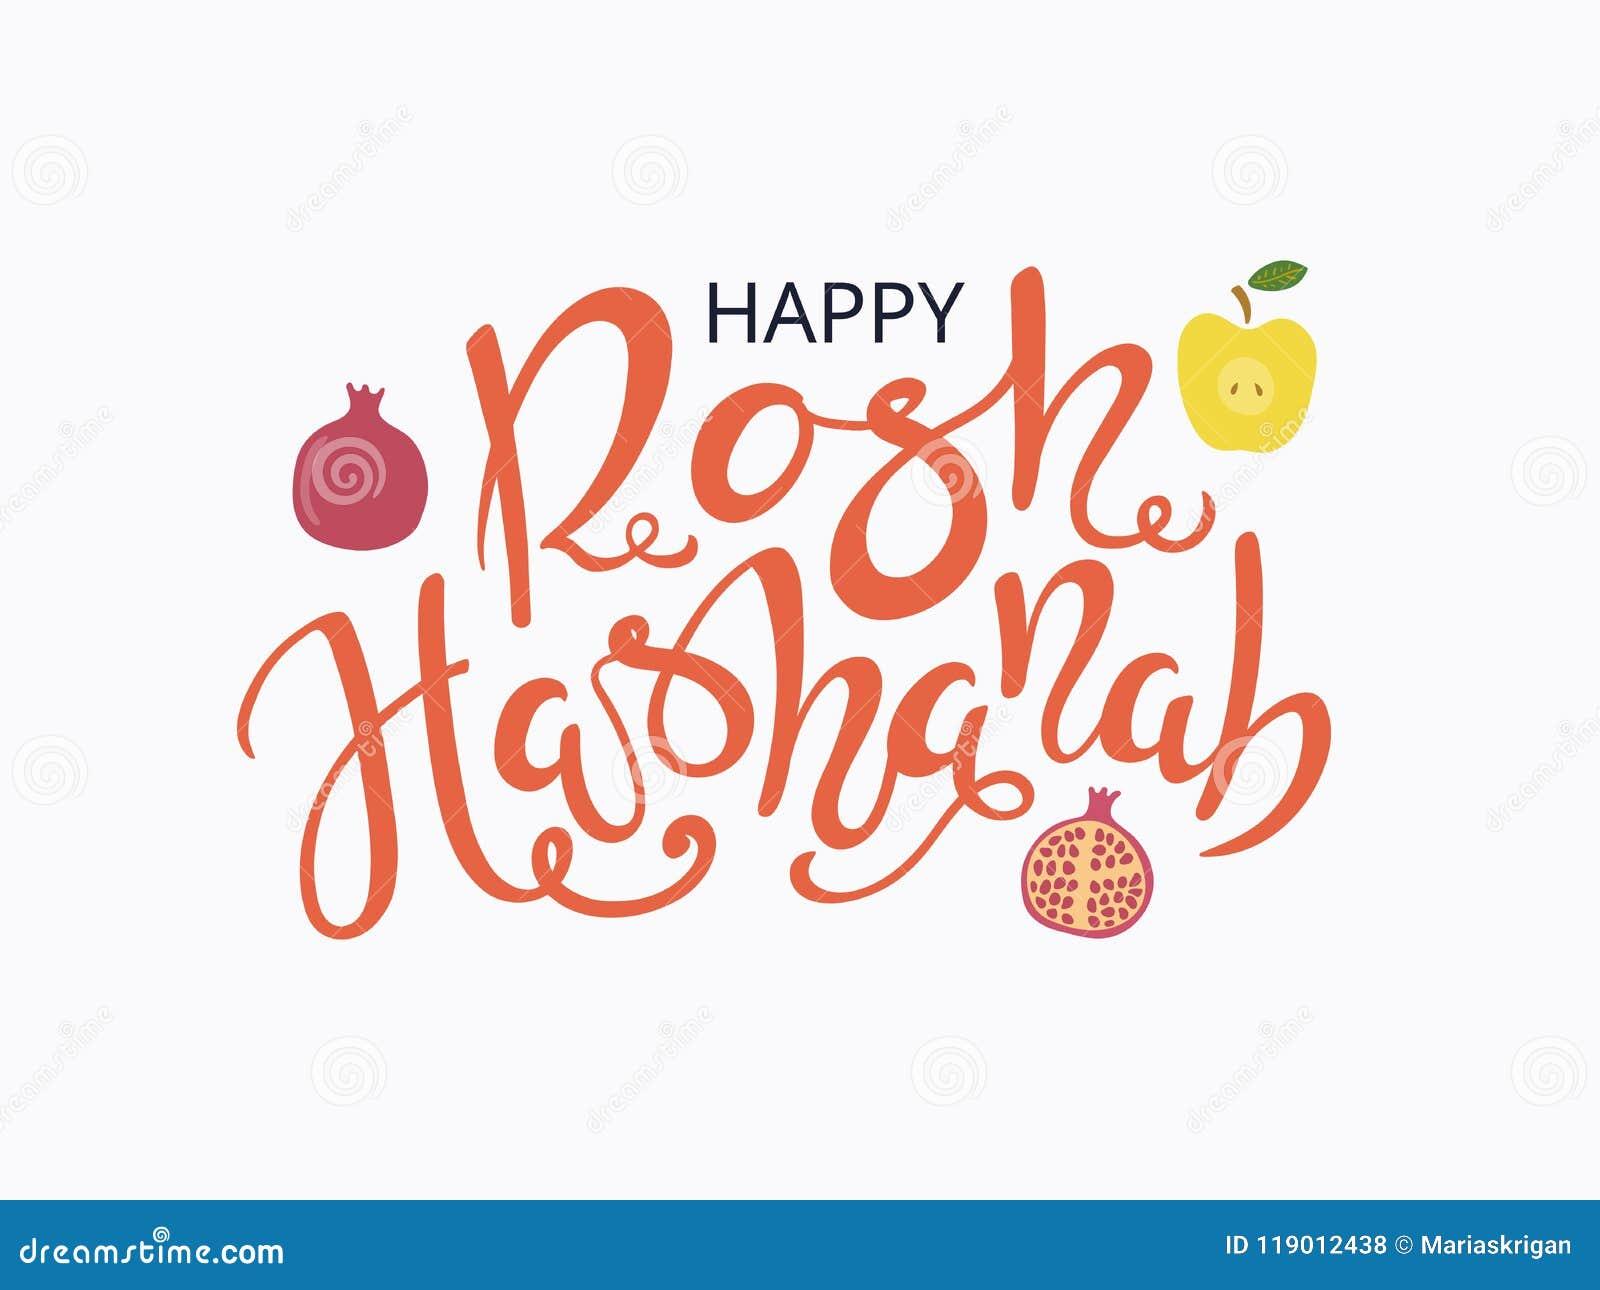 Rosh Hashanah Happy Quotes Topsimages